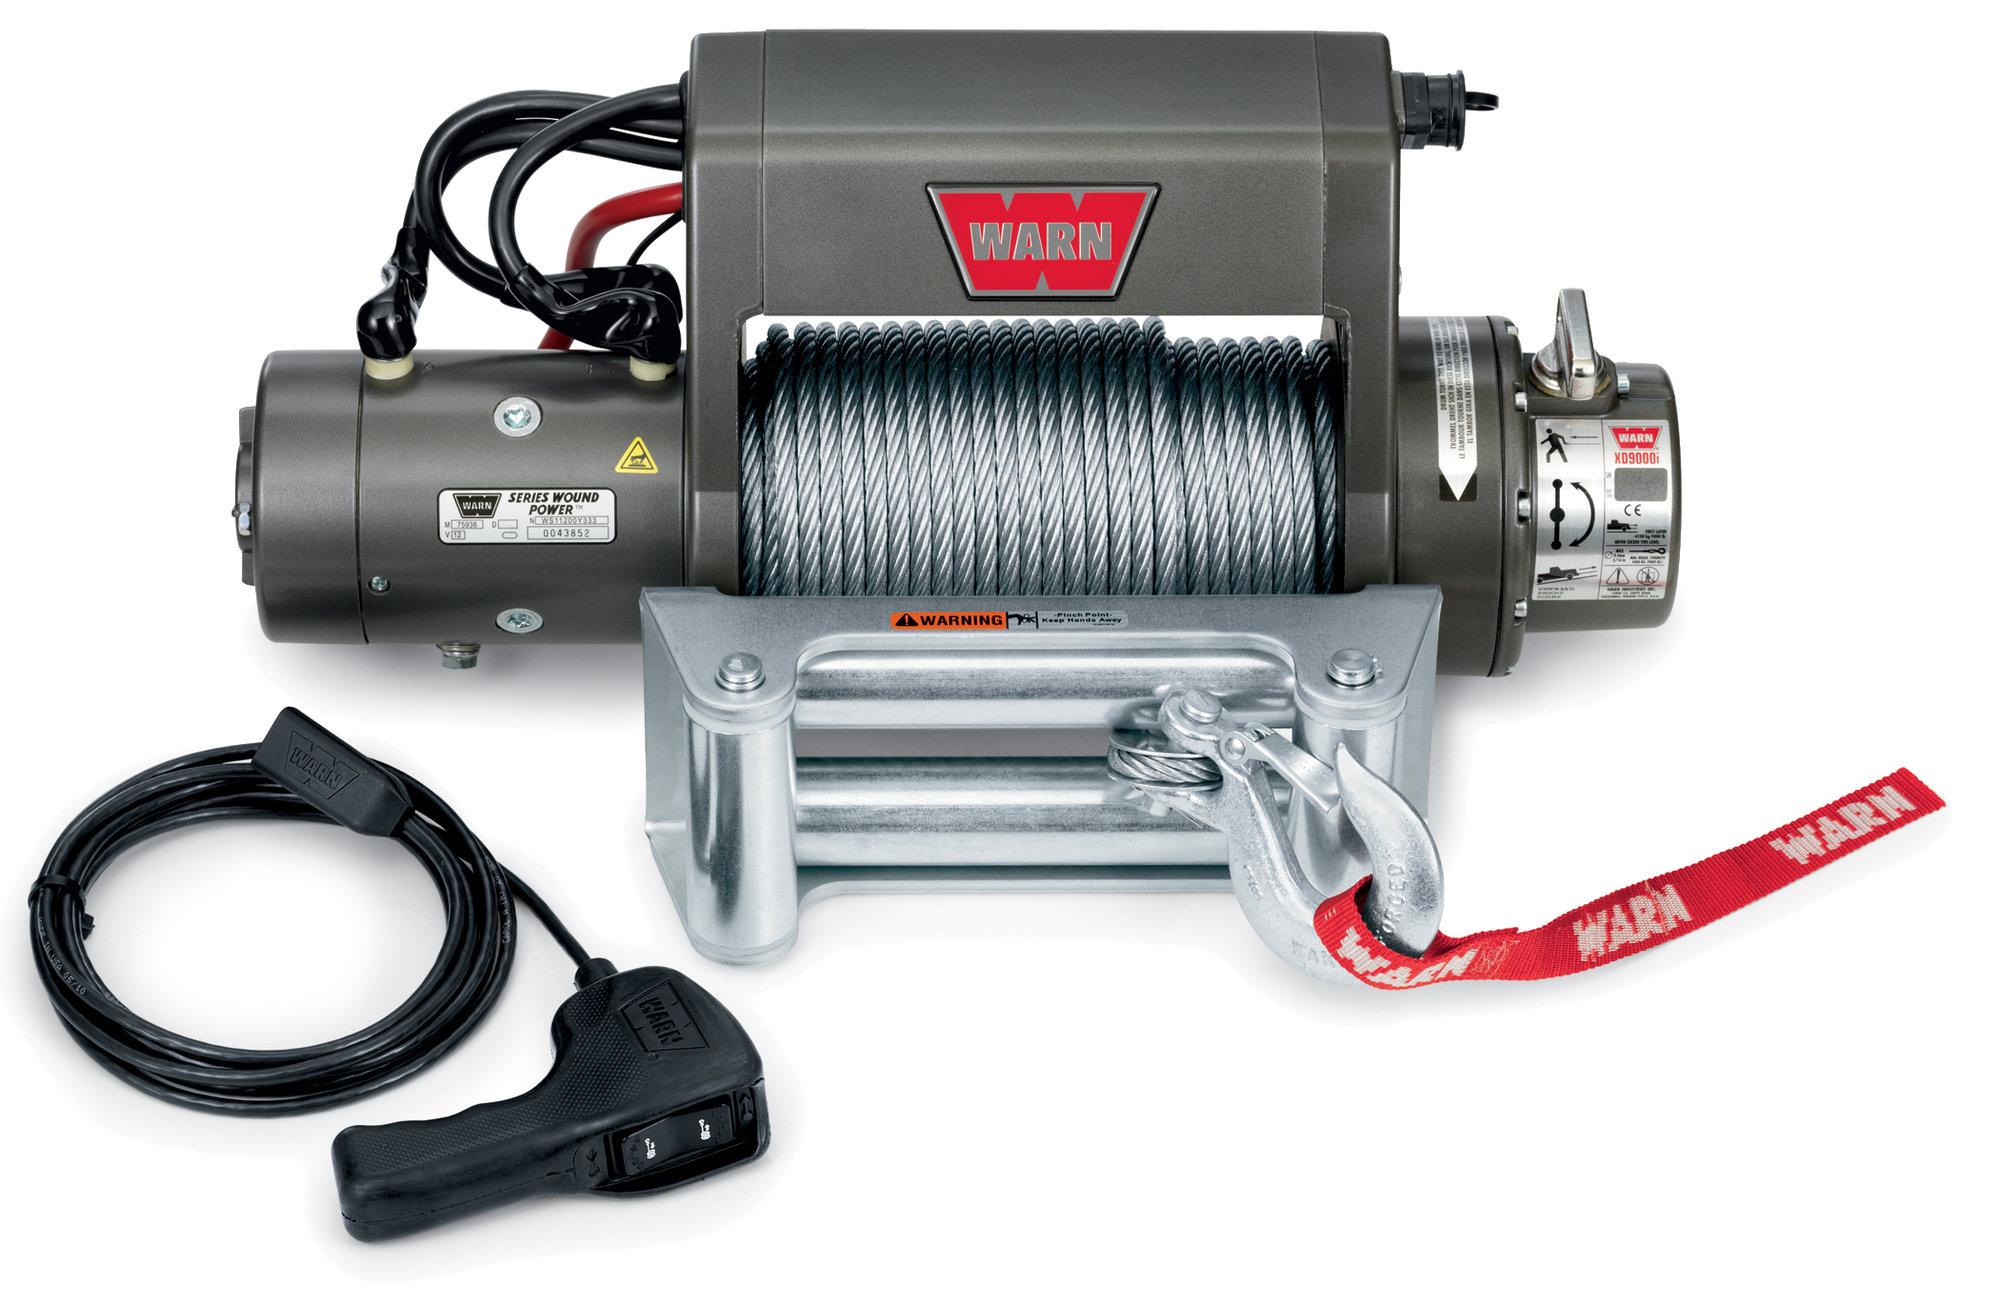 warn winch yamaha golf cart solenoid wiring diagram 27550 xd9000i self recovery quadratec